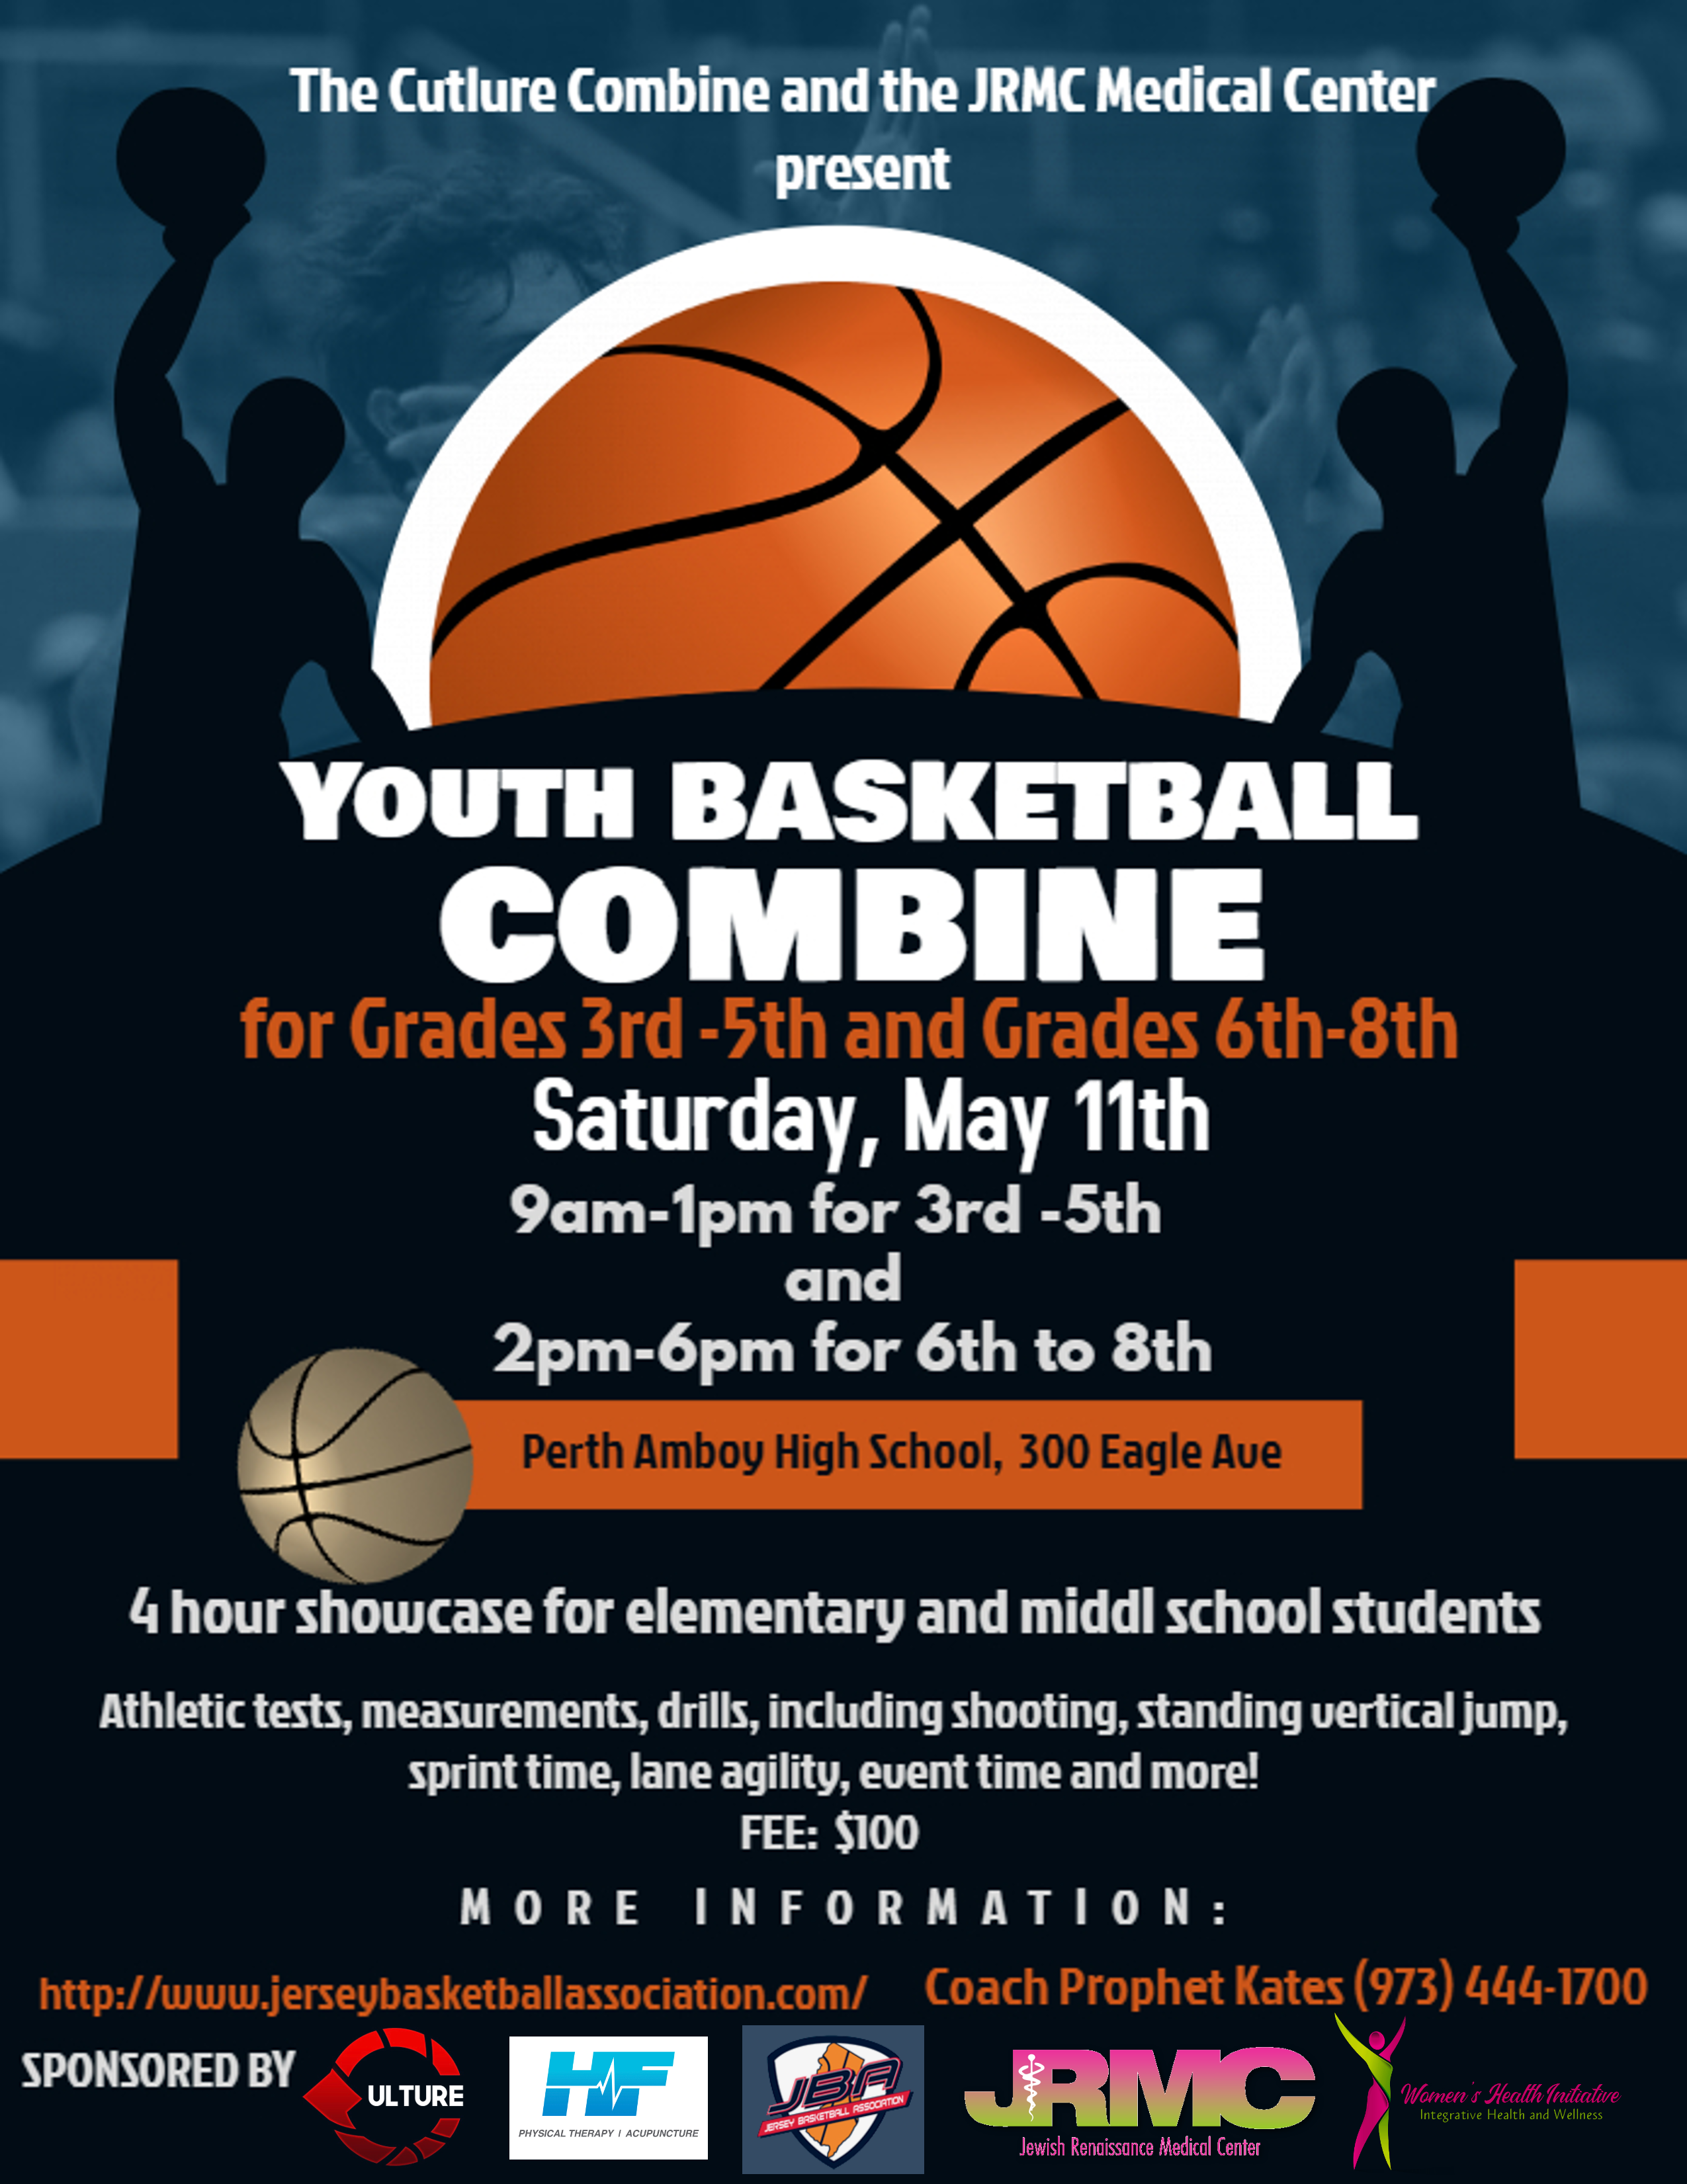 Youth Basketball Combine